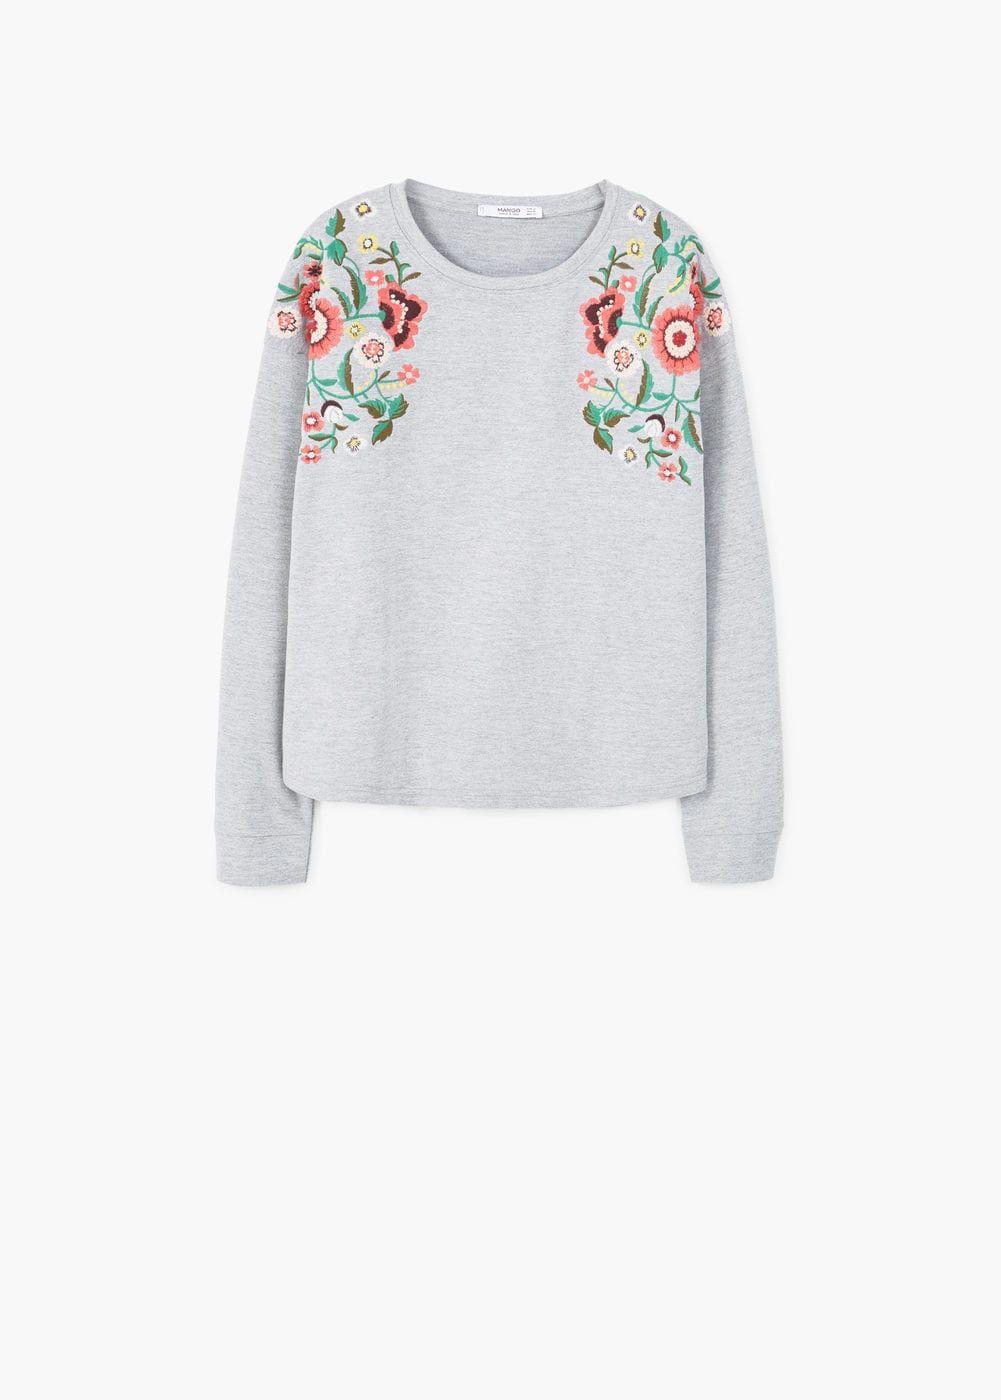 a8cea126fda0 Sweat-shirt broderie florale - Femme